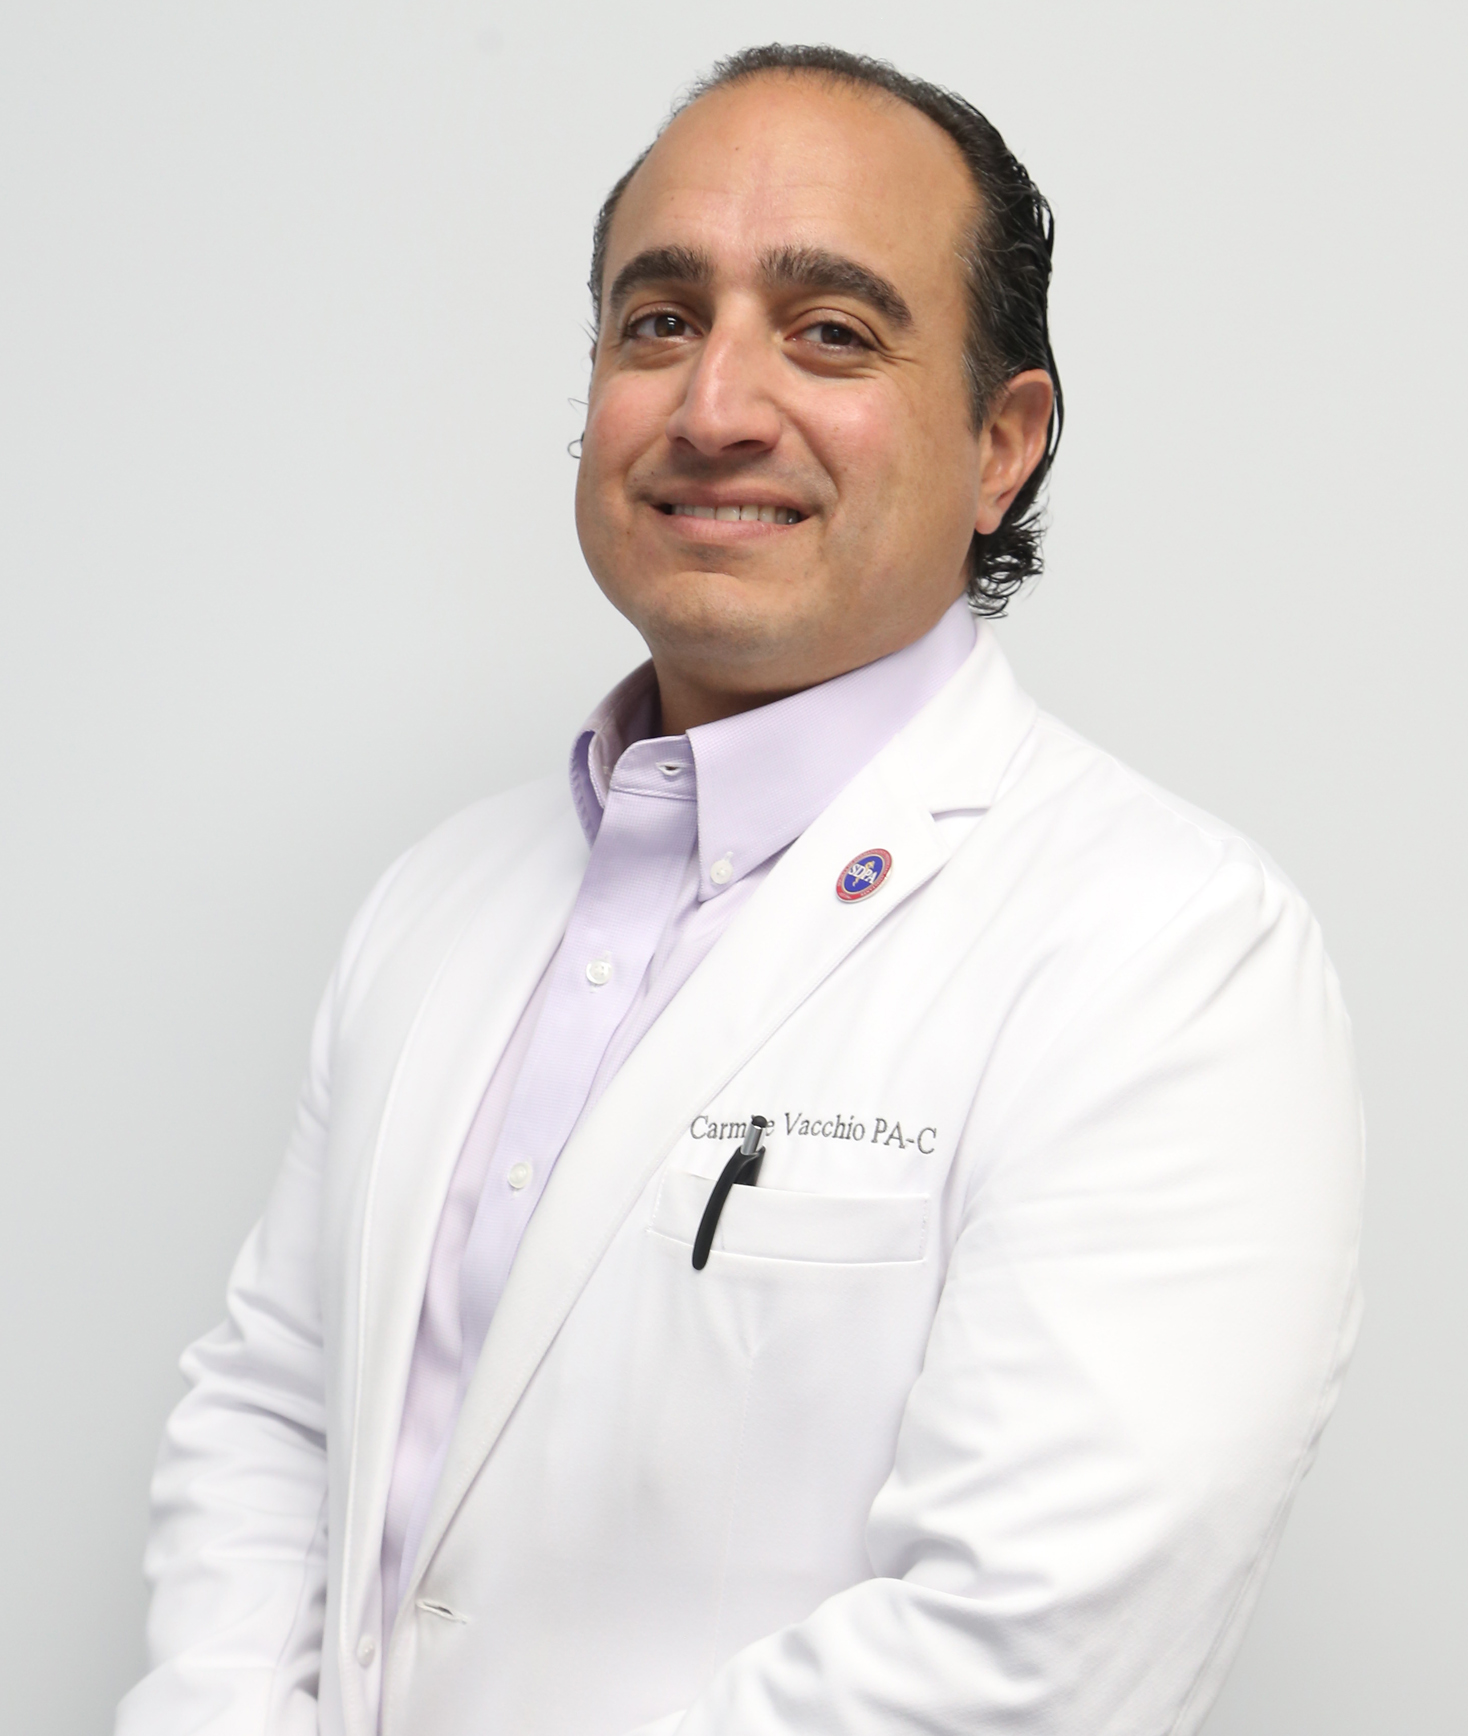 Touro College Pa Program >> Carmine Vacchio, PA, AAPA - Long Island Dermatology | Long Island Dermatology